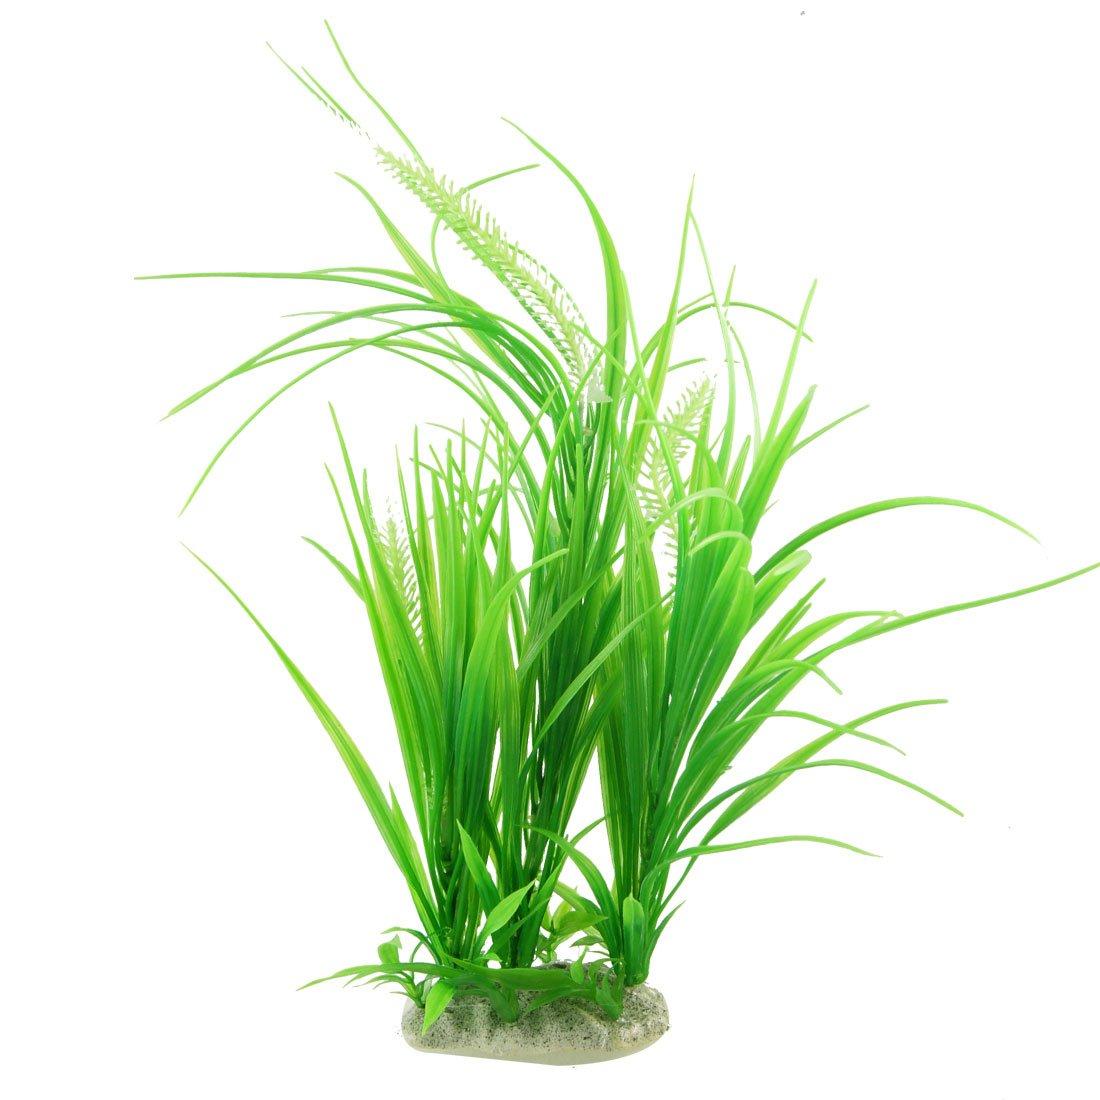 uxcell プラスチック植物 人工植物 水族館装飾 人工水草 グリーン セラミックベース 43cmの高さ B008MMCXIA